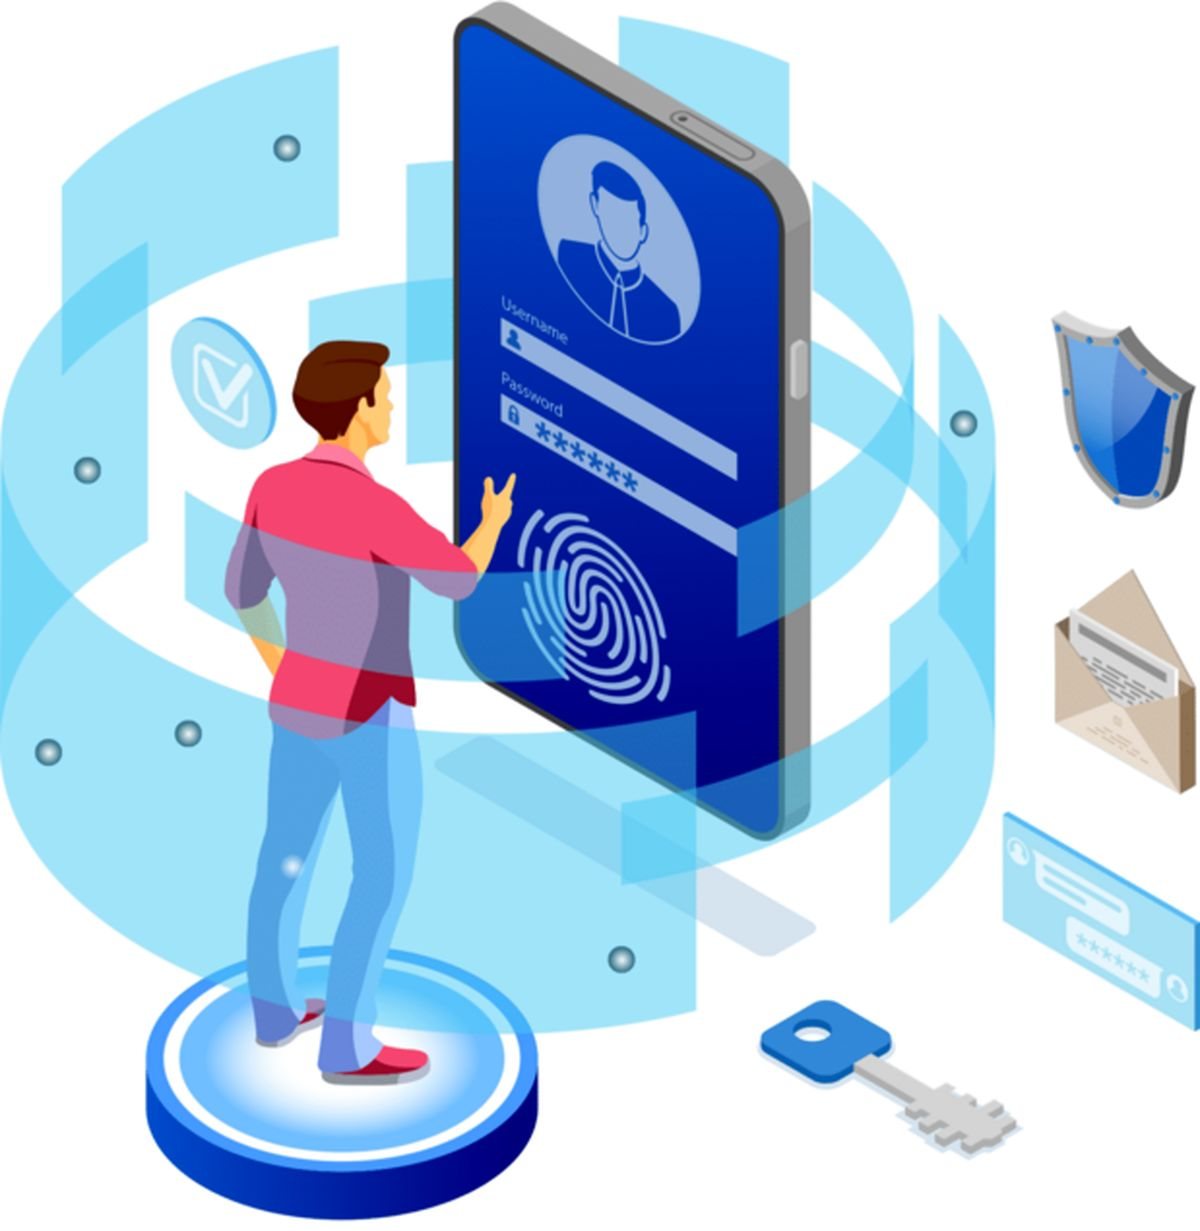 معرفی سامانه خدمات آنلاین با کمک فناوری هوش مصنوعی